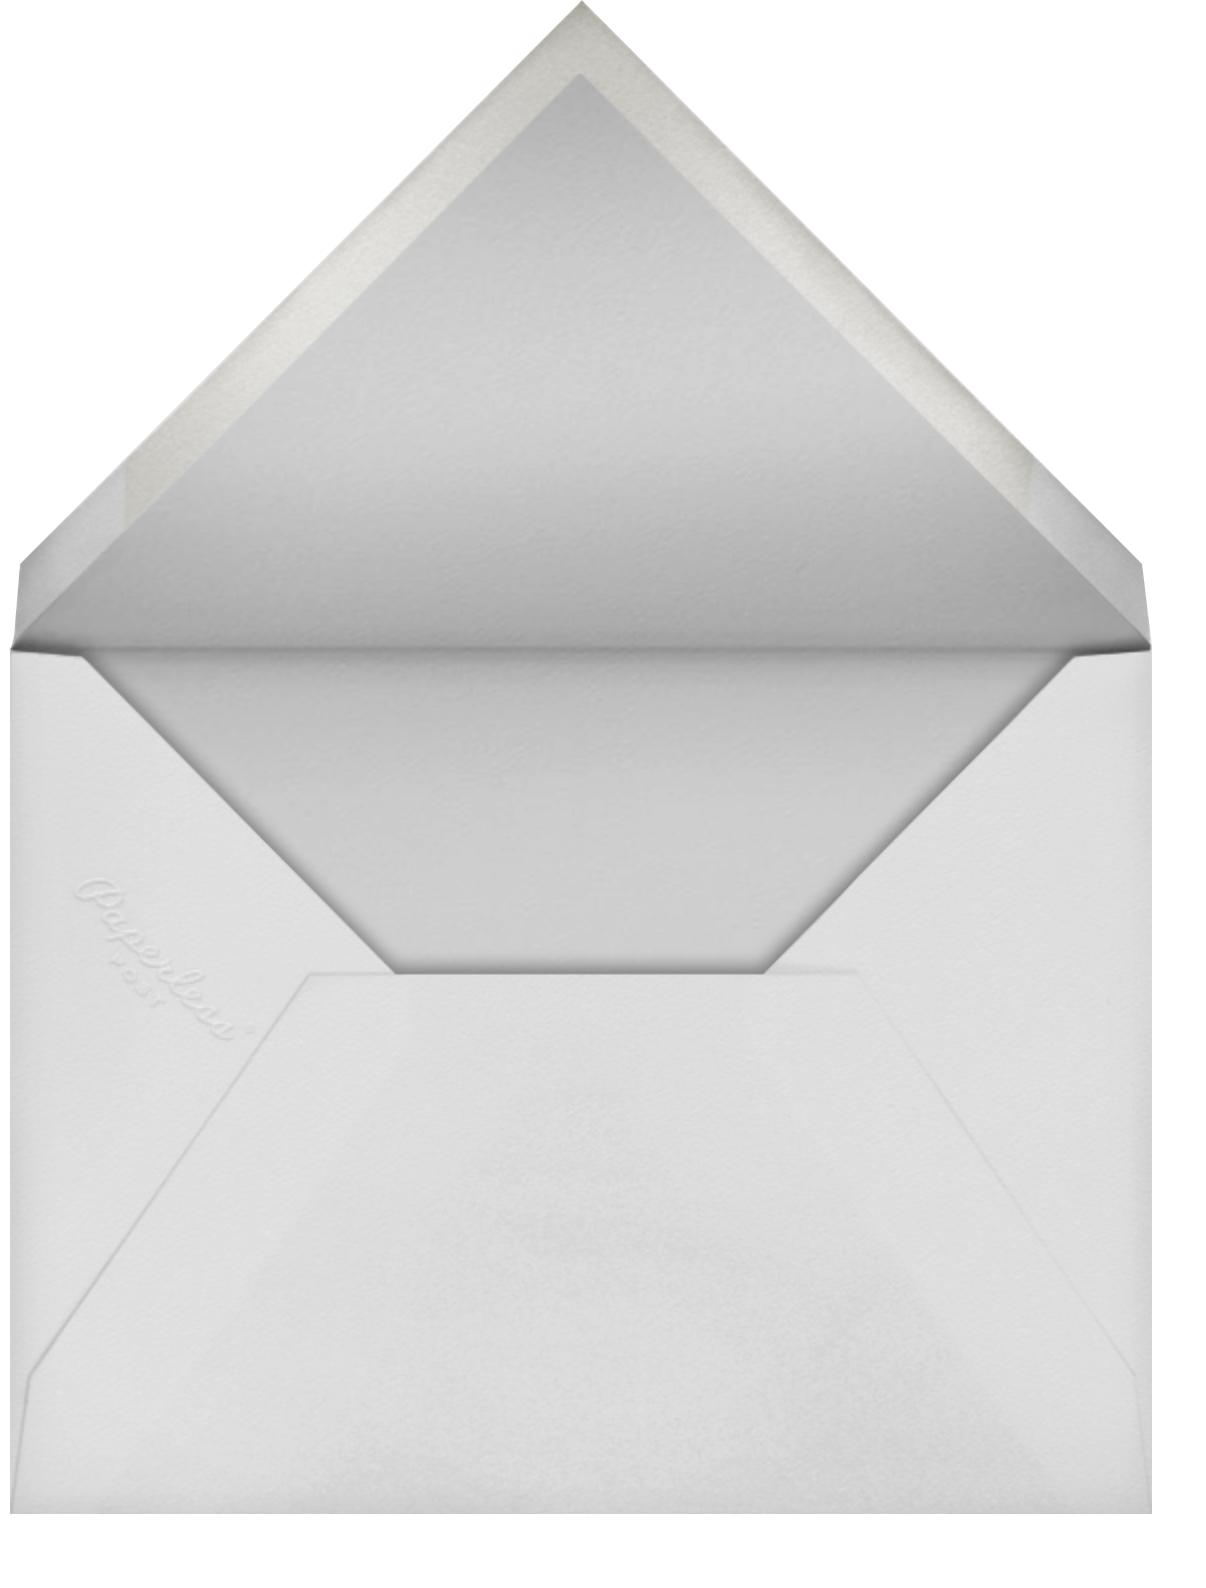 Fleurs d'Alençon (Invitation) - White - Oscar de la Renta - All - envelope back